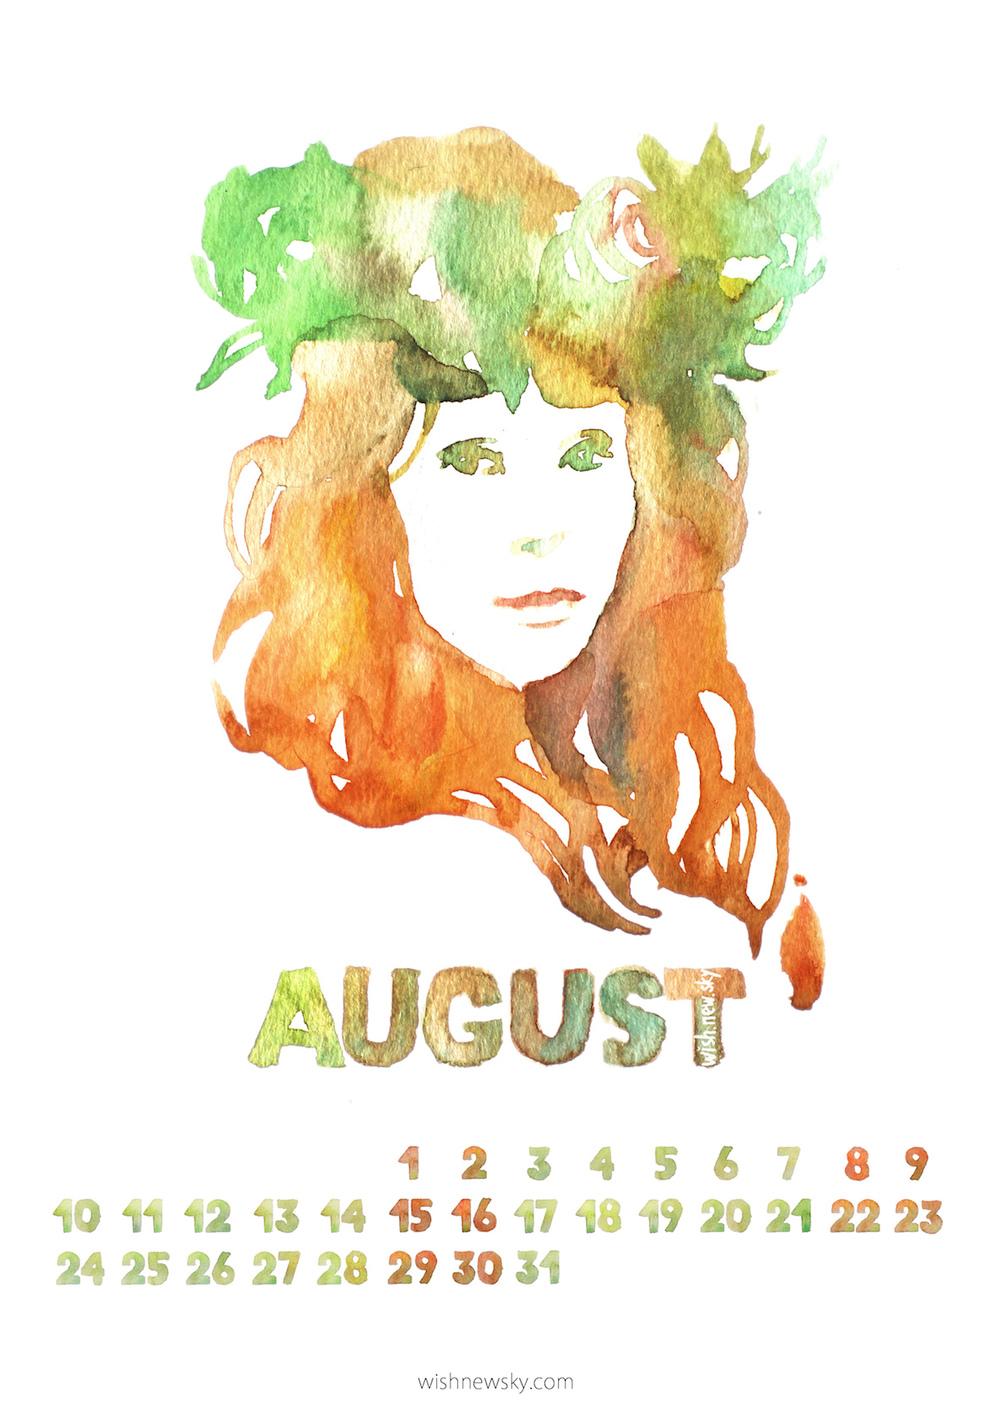 8_August.jpg